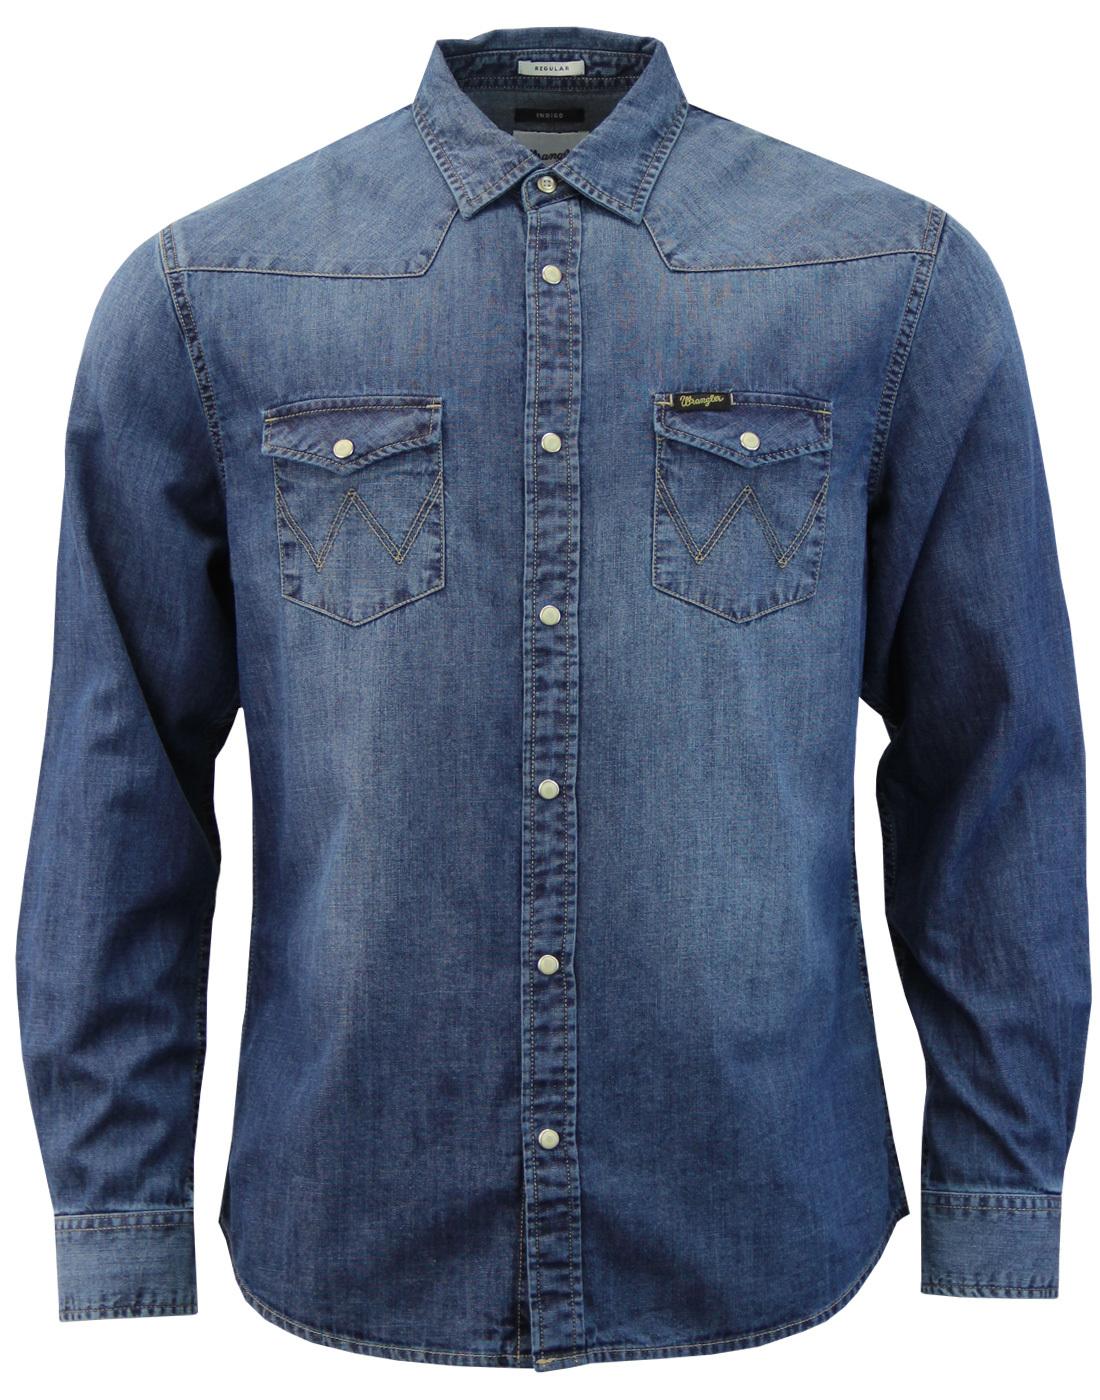 1f68ee8109 WRANGLER Men s Retro 70s Mod Mid Indigo Denim Western Shirt